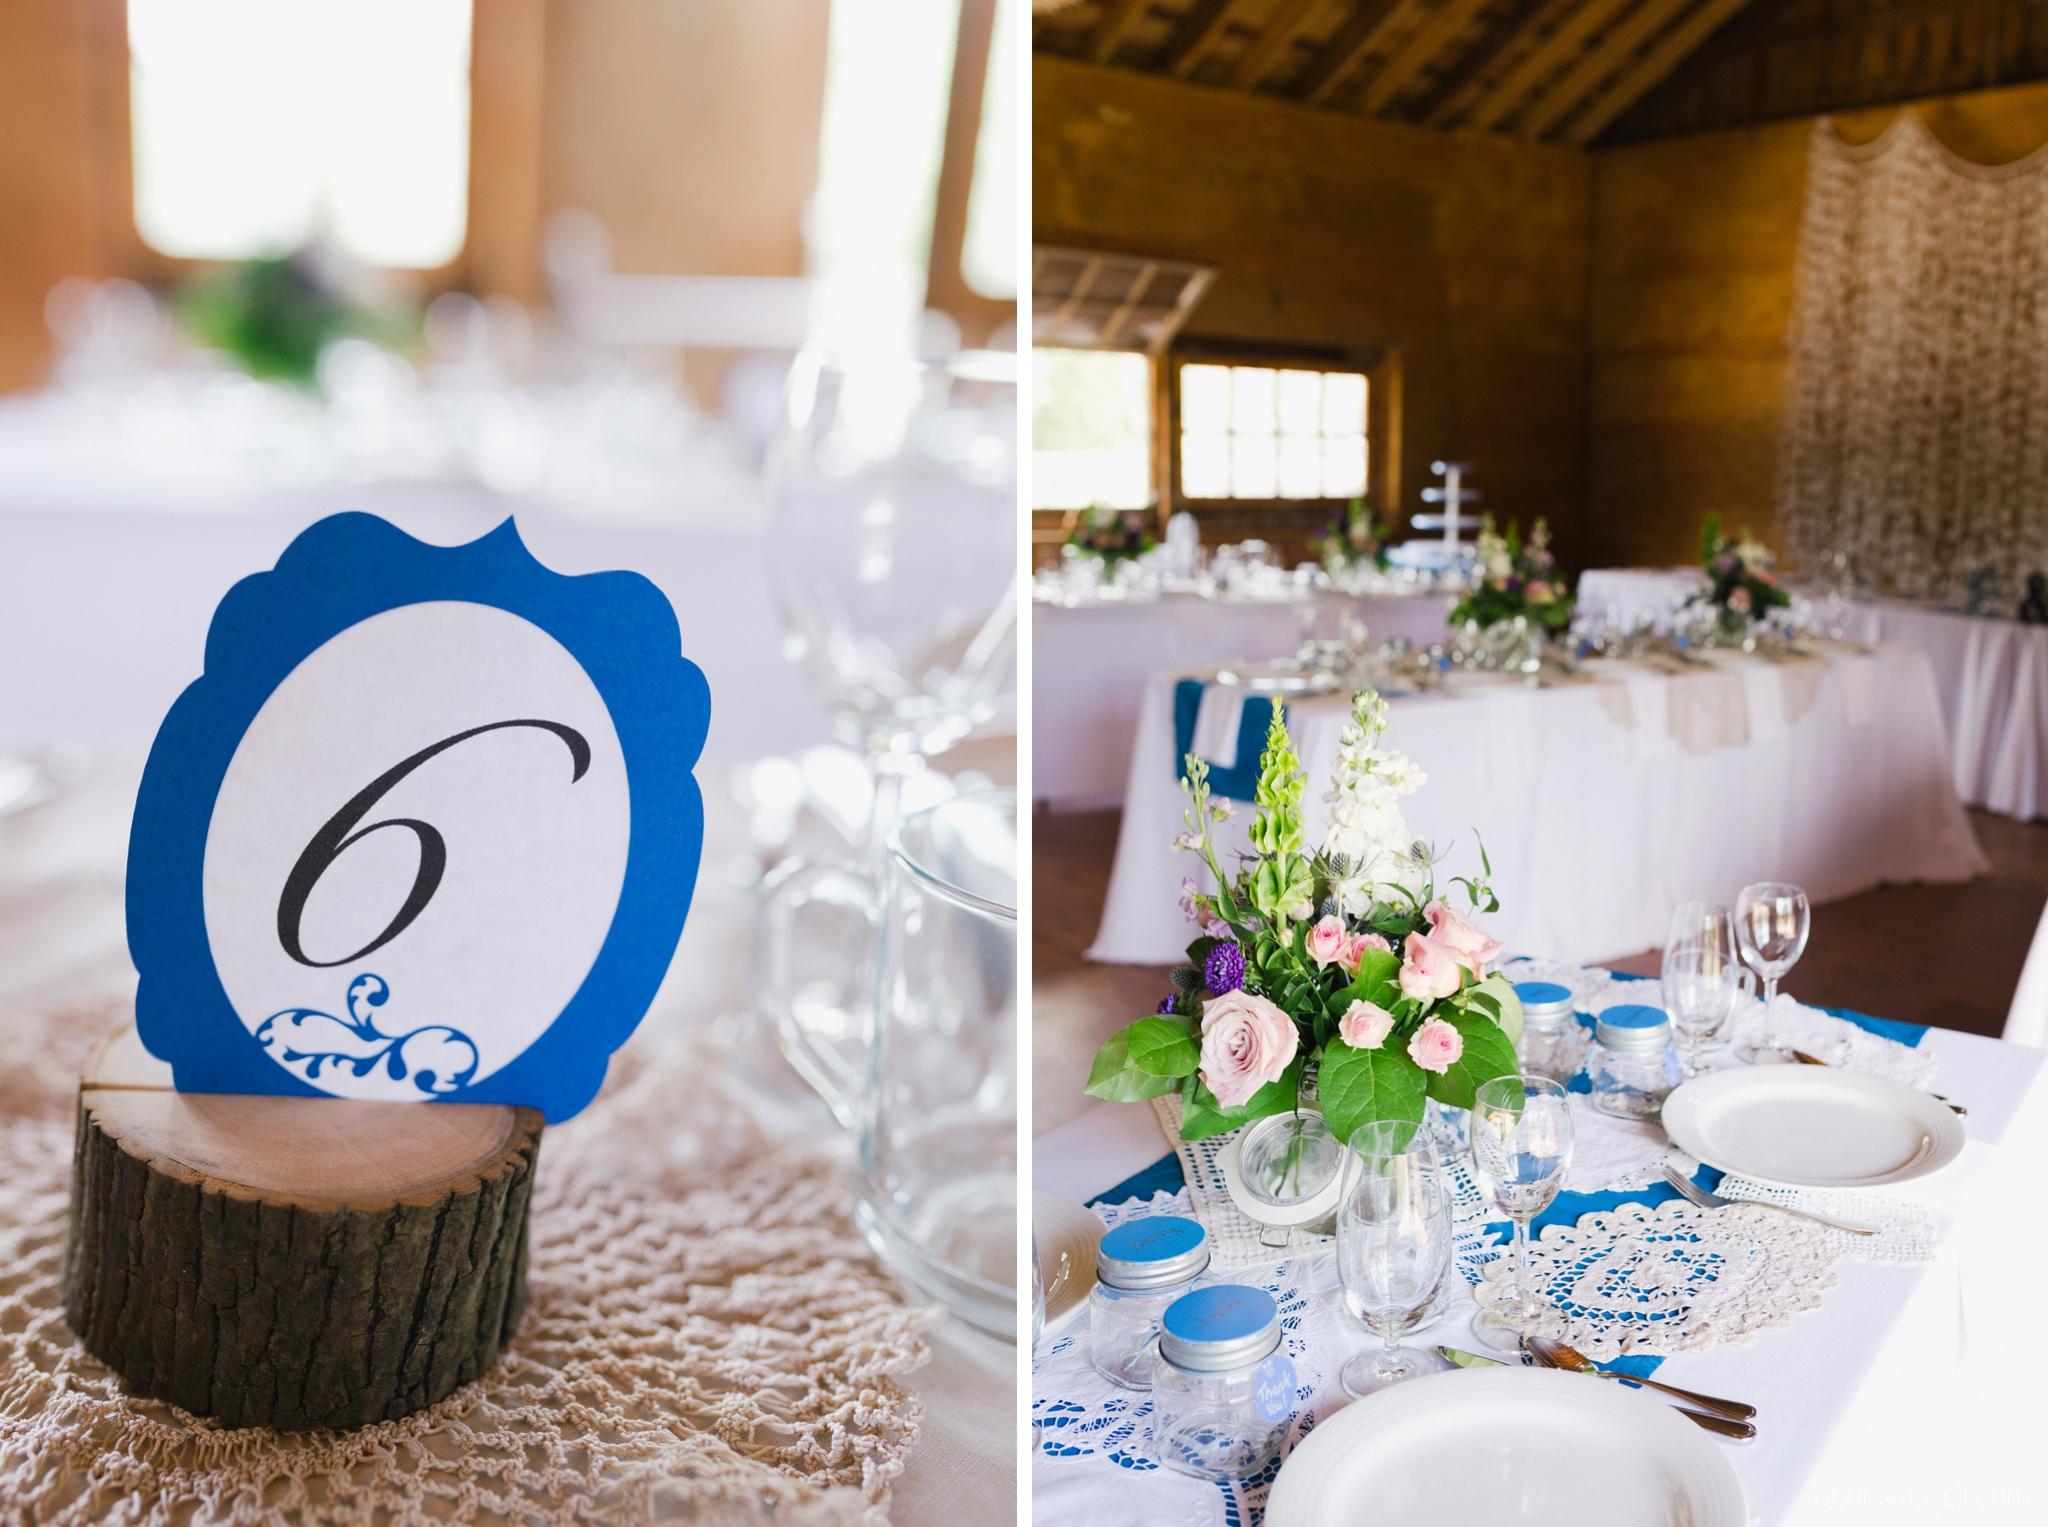 15-wedding-details-decor-signage-burlington-wedding-photographer.jpg